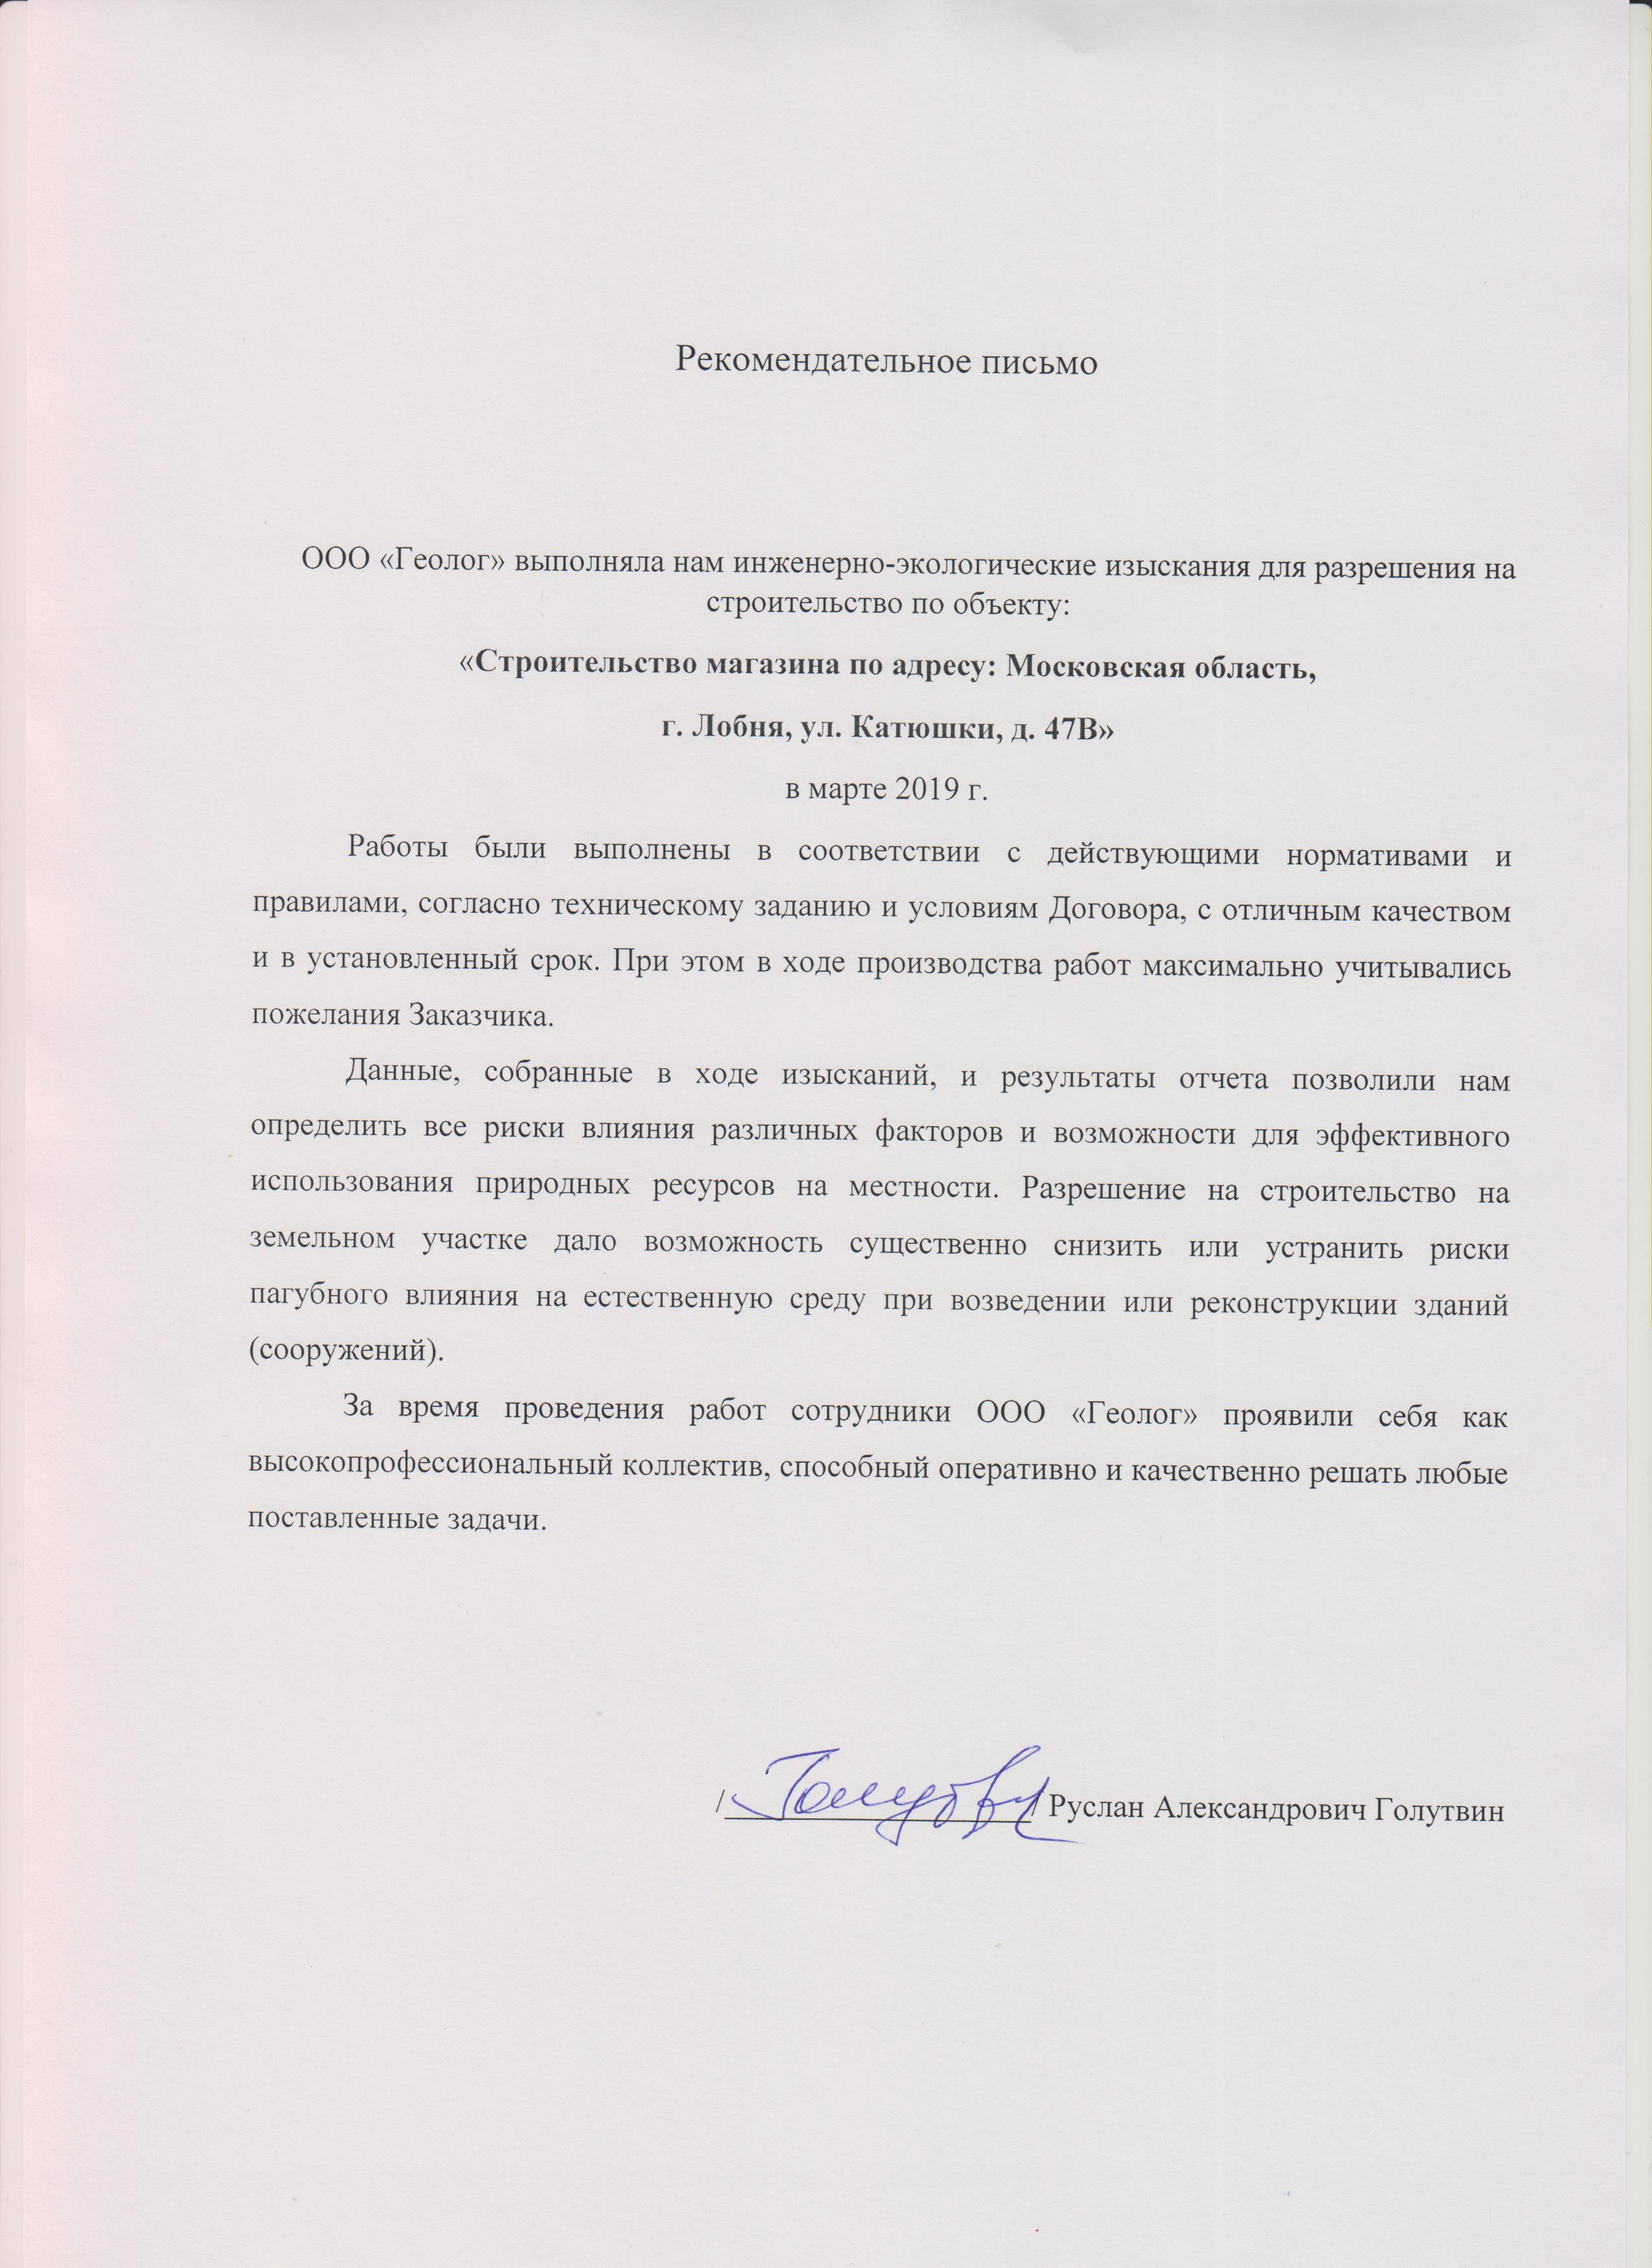 Отзыв Р.А. Голутвин